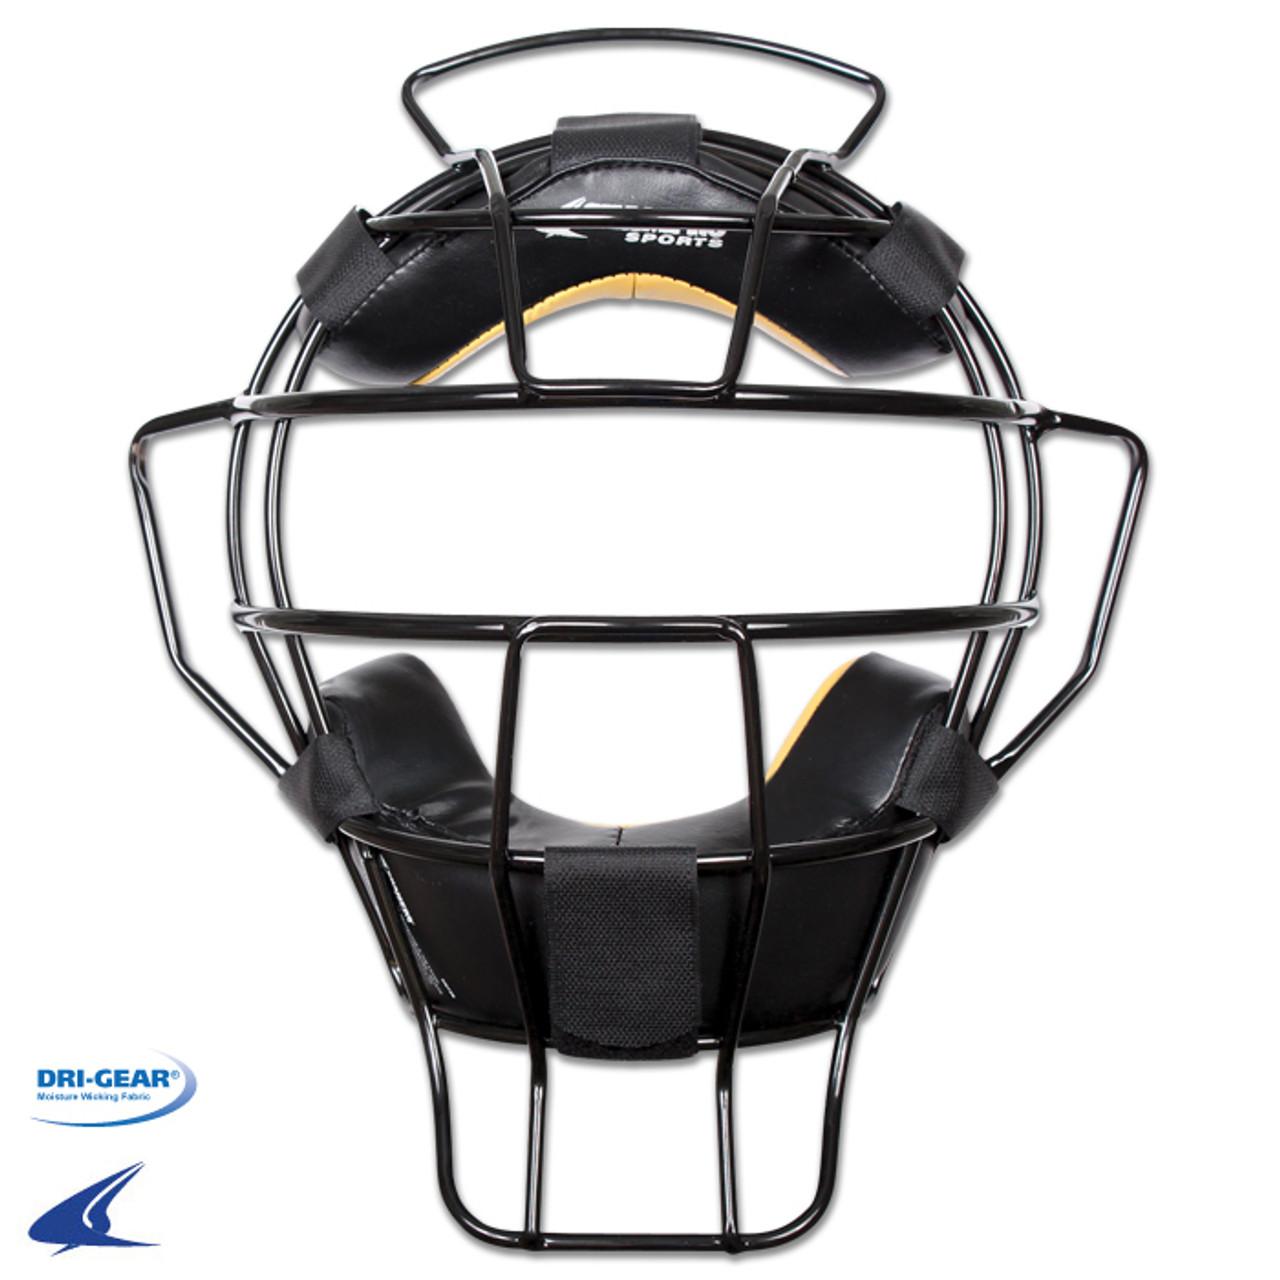 Champro Lightweight Umpire Mask Leather Biofresh Pads